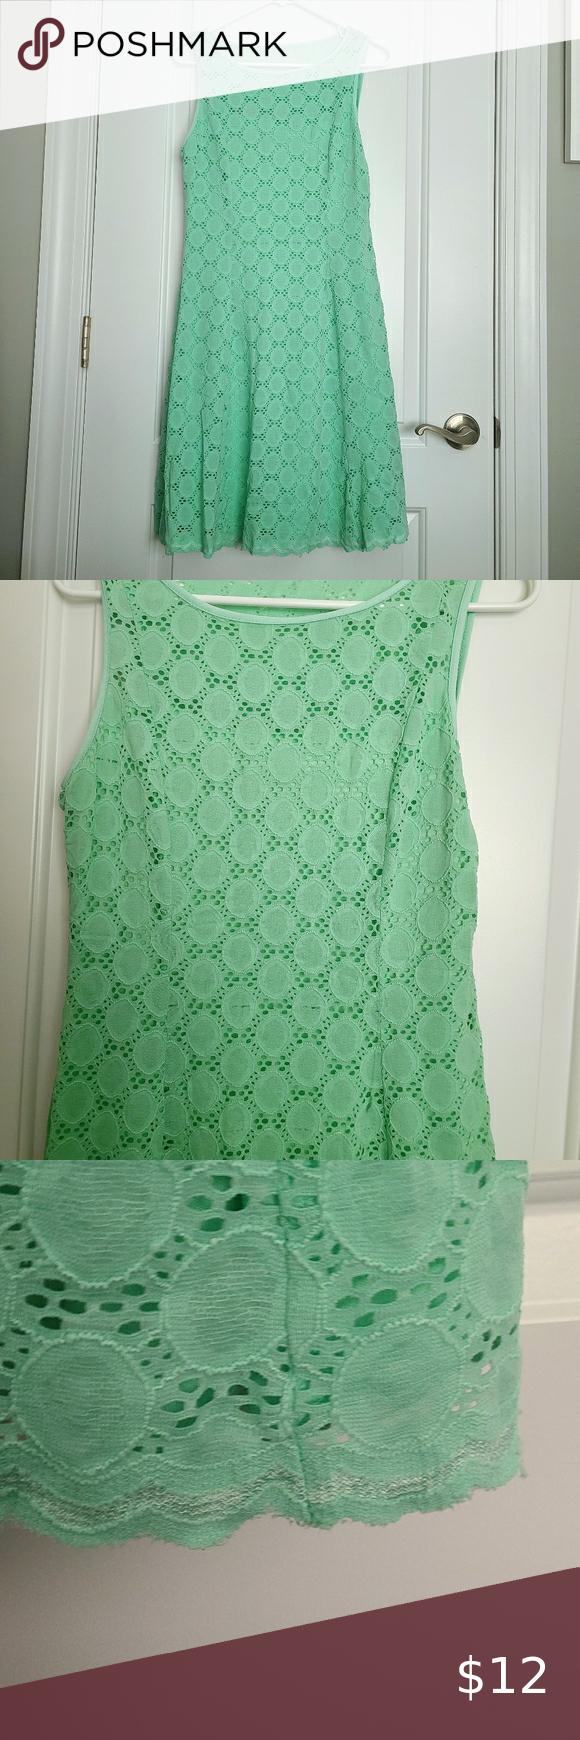 Rn Studio Eyelet Lace Midi Dress Mint Green Midi Dress Navy Blue Lace Dress Lace Blue Dress [ 1740 x 580 Pixel ]